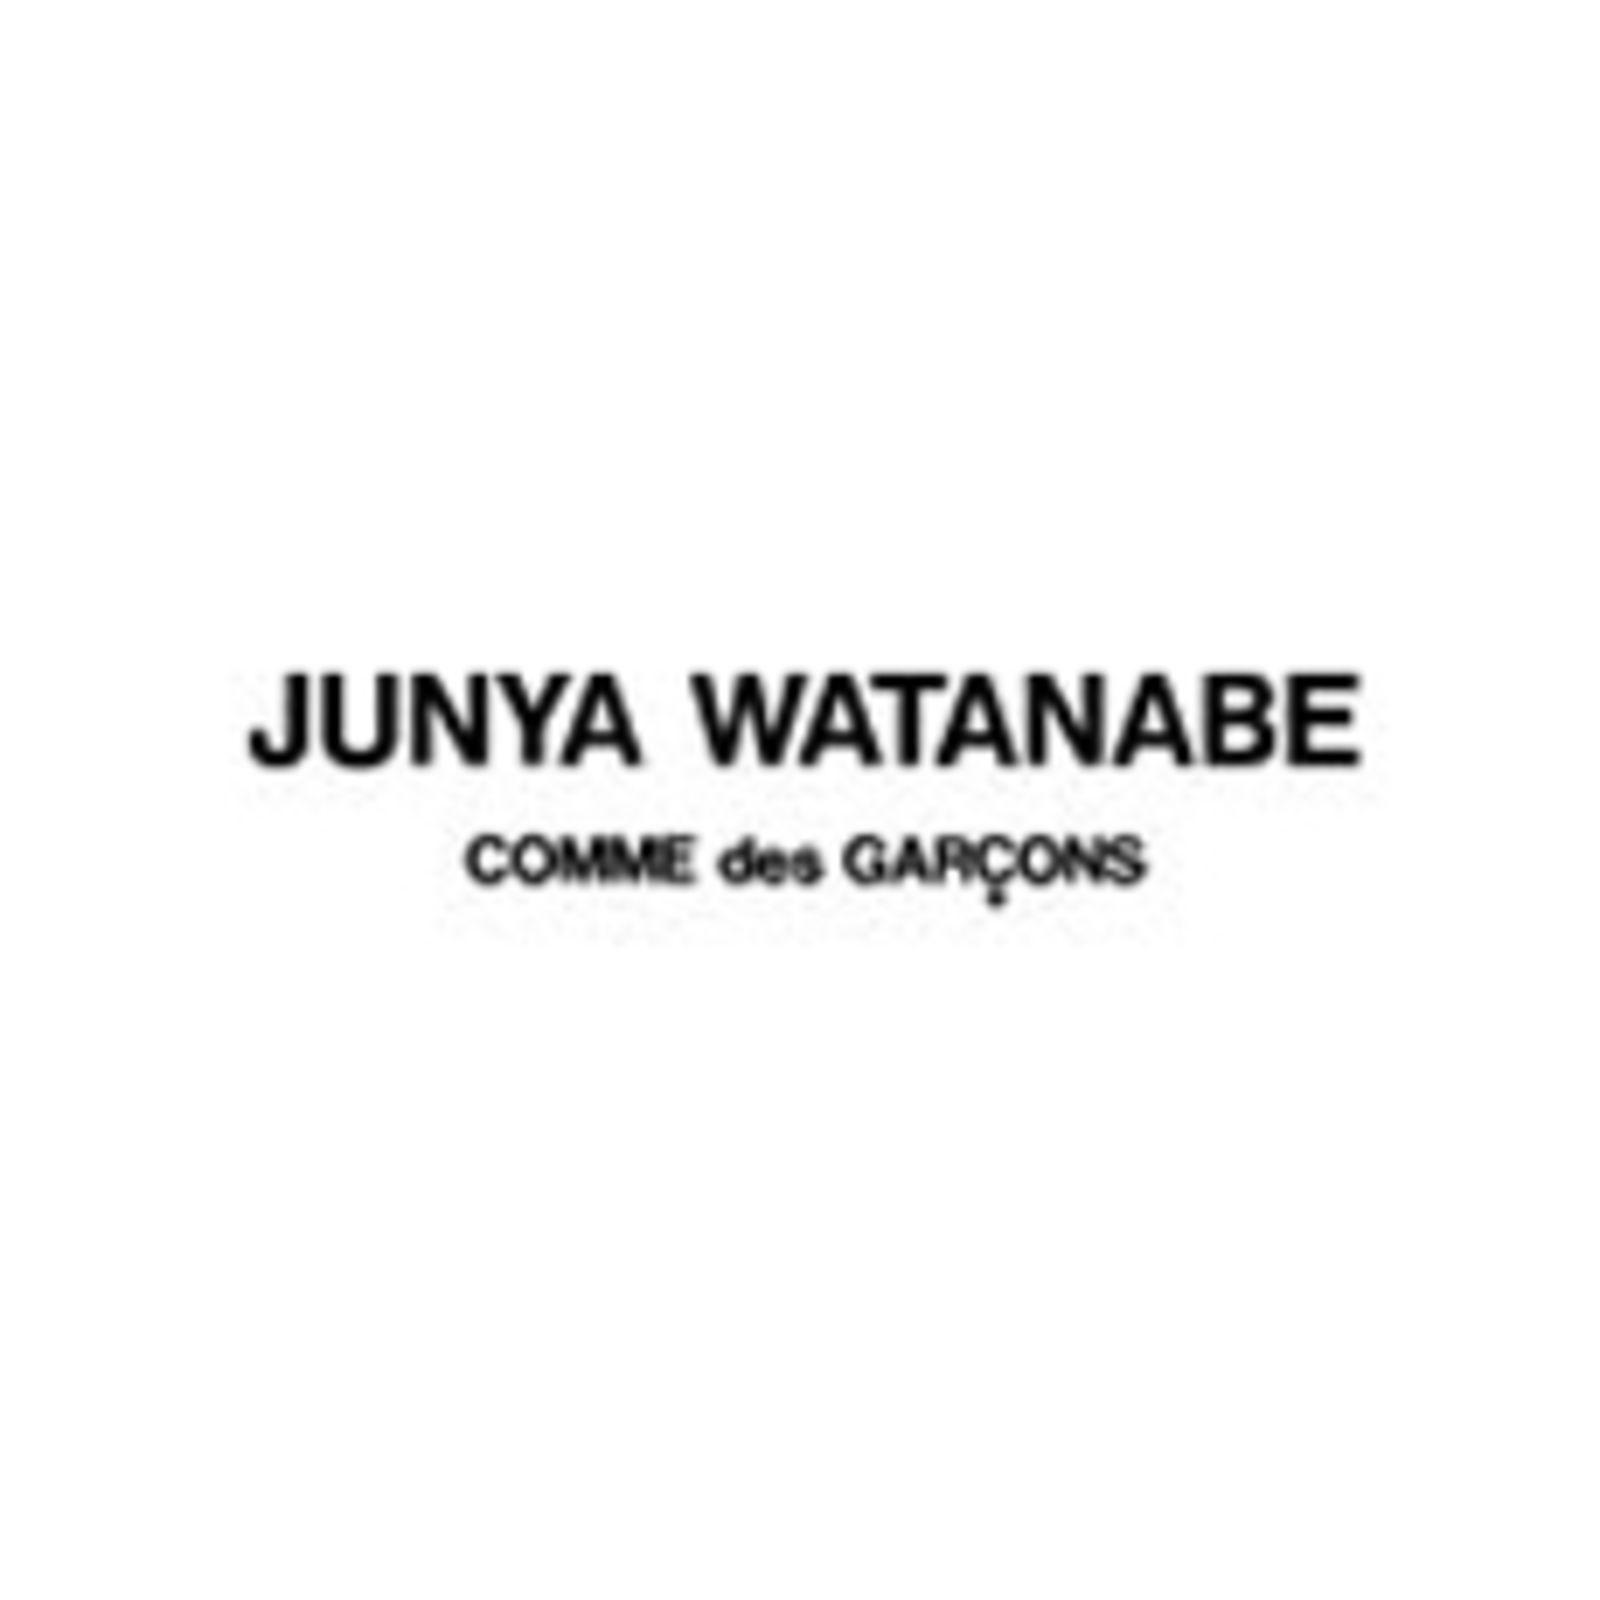 JUNYA WATANABE (Image 1)